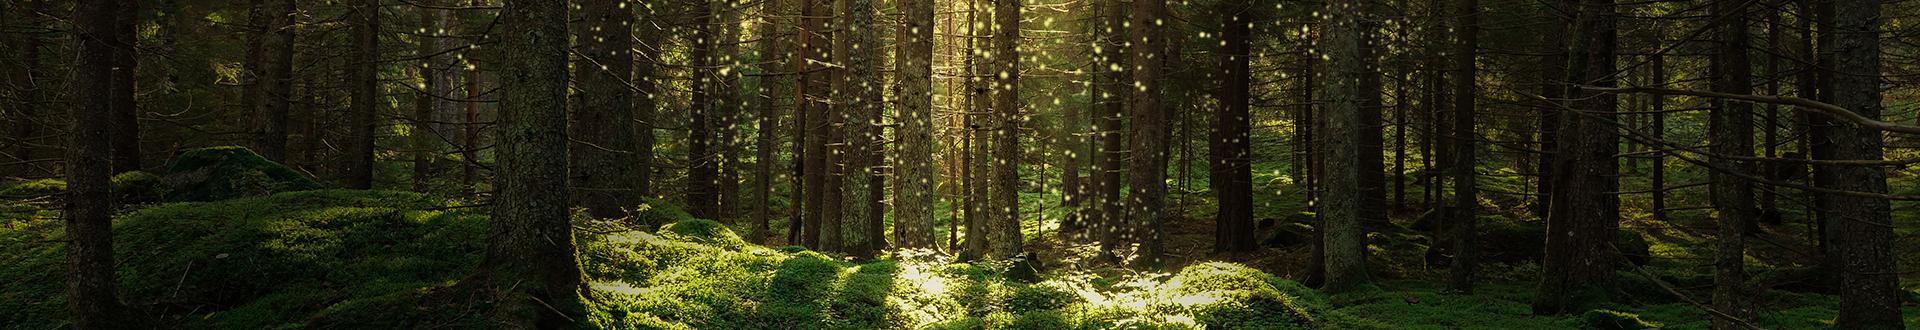 słoneczny las